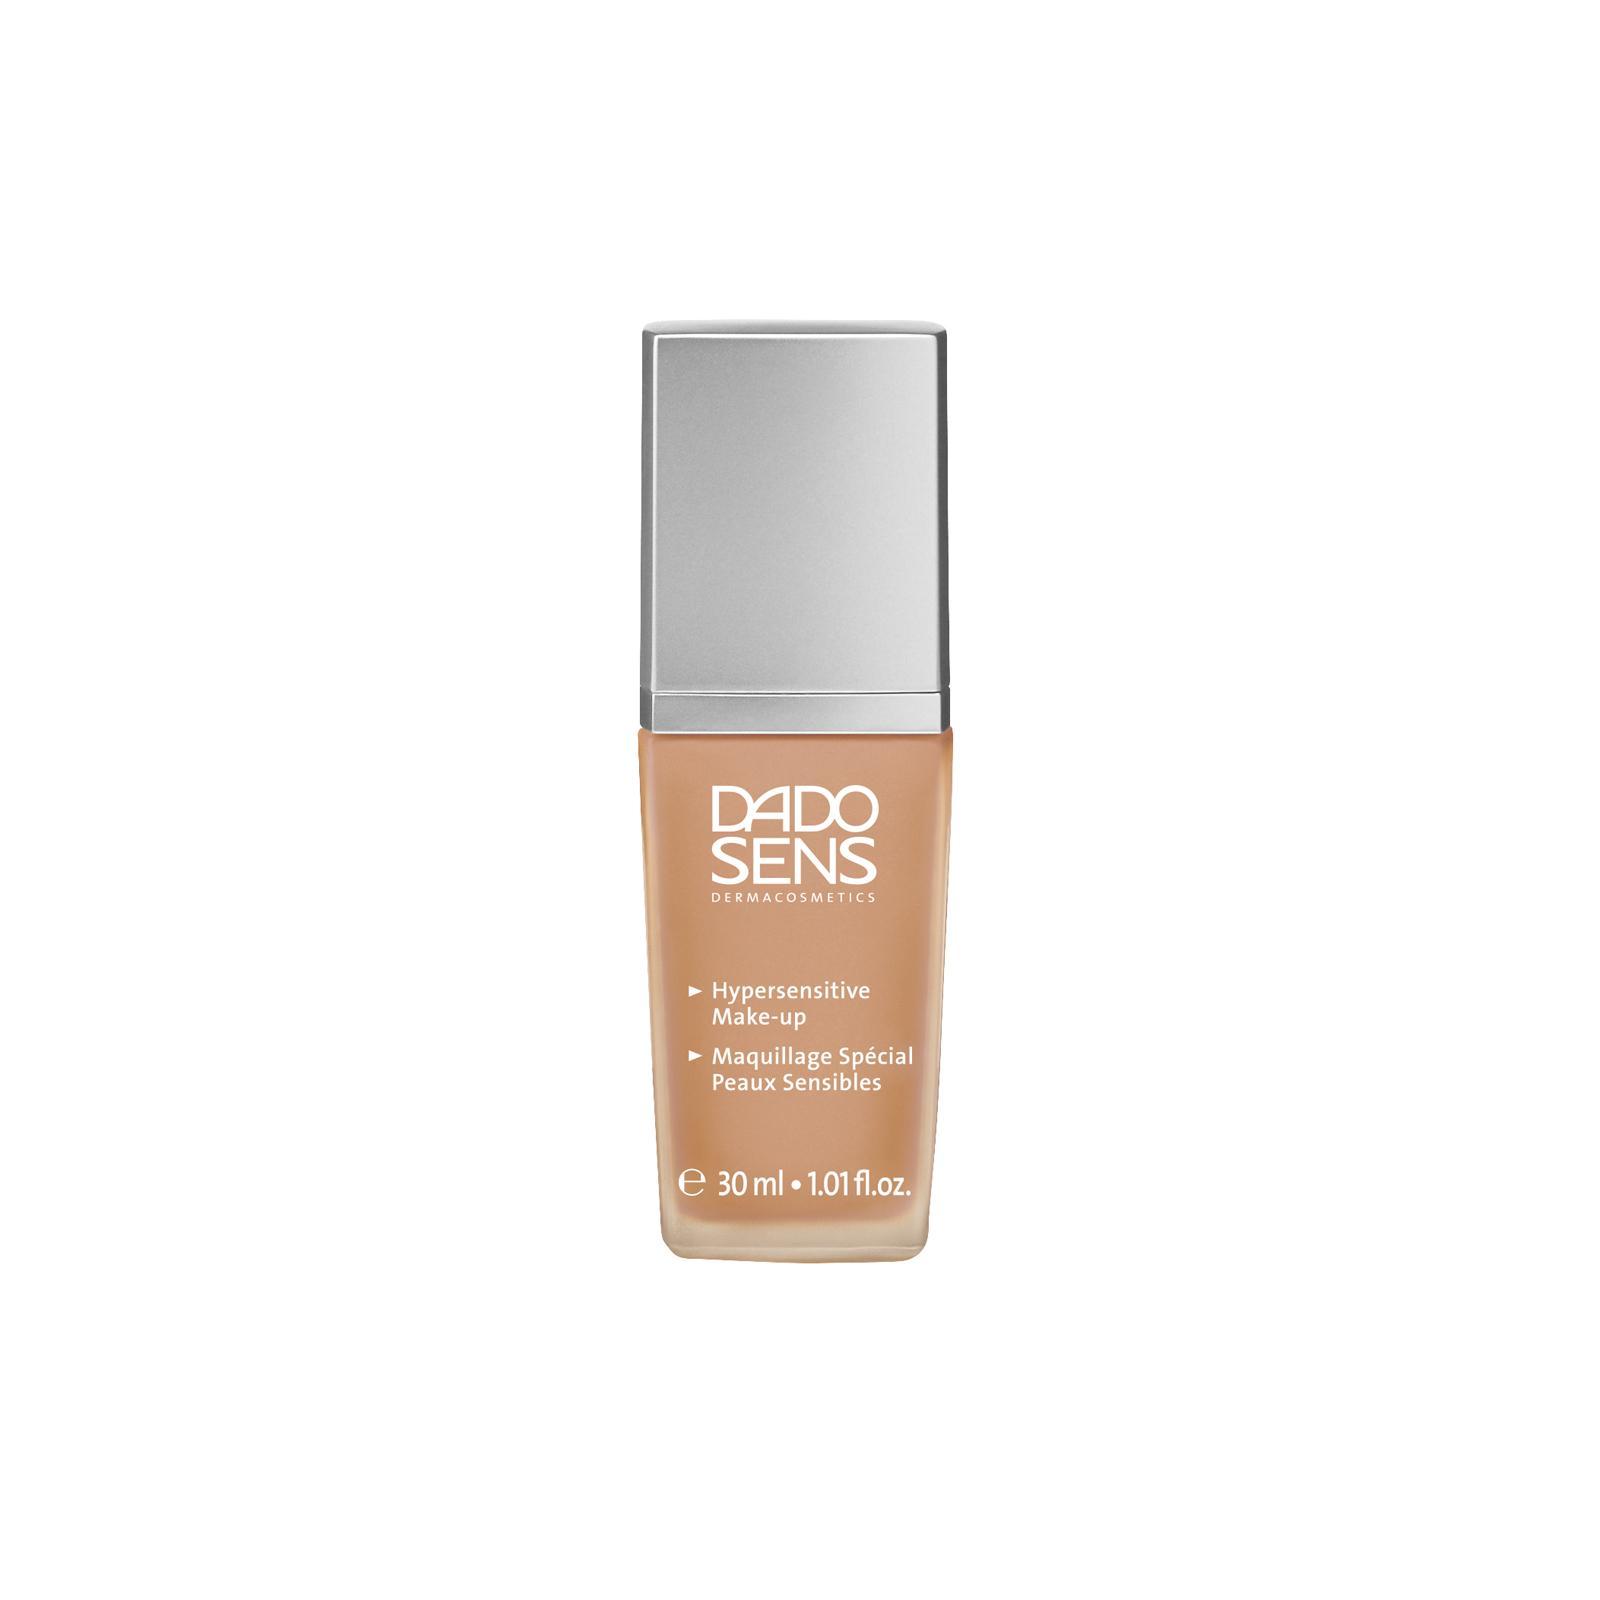 Dado Sens Tekutý make-up pro citlivou pleť Beige, Hypersensitive 30 ml